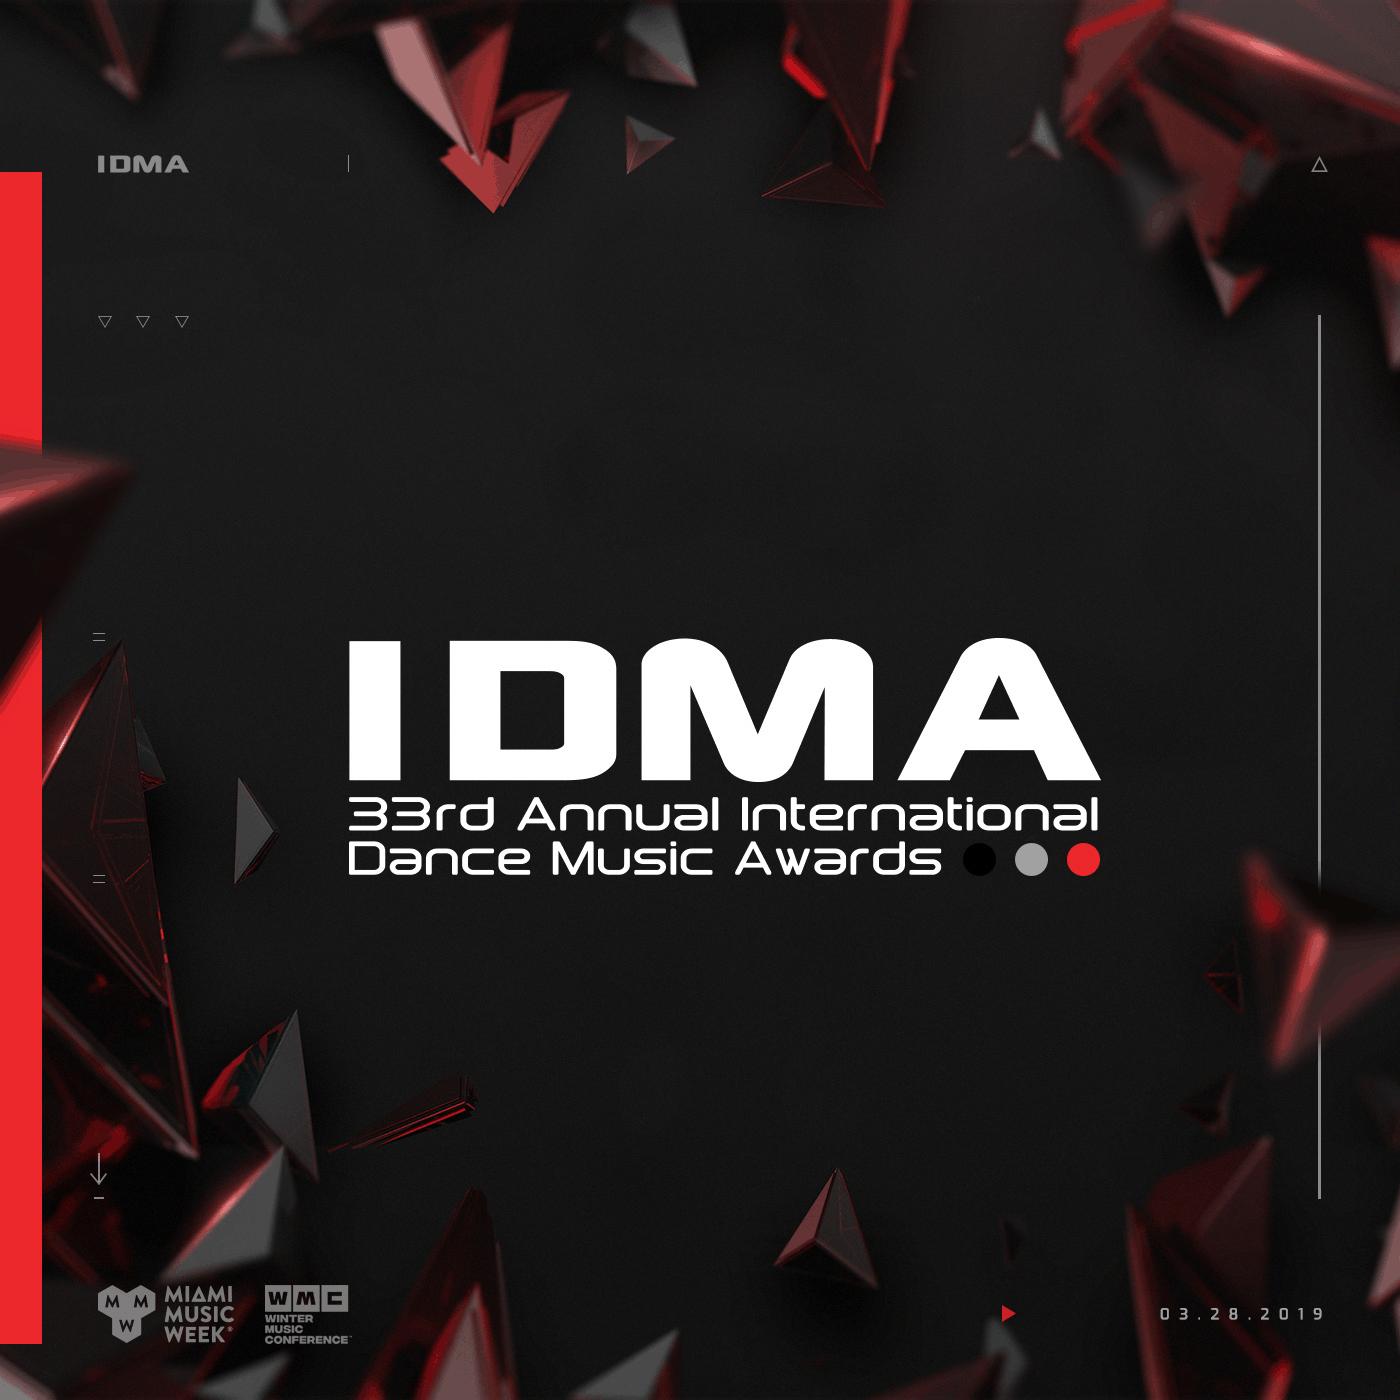 The International Dance Music Awards (IDMA 2019) returns for 33rd annual program